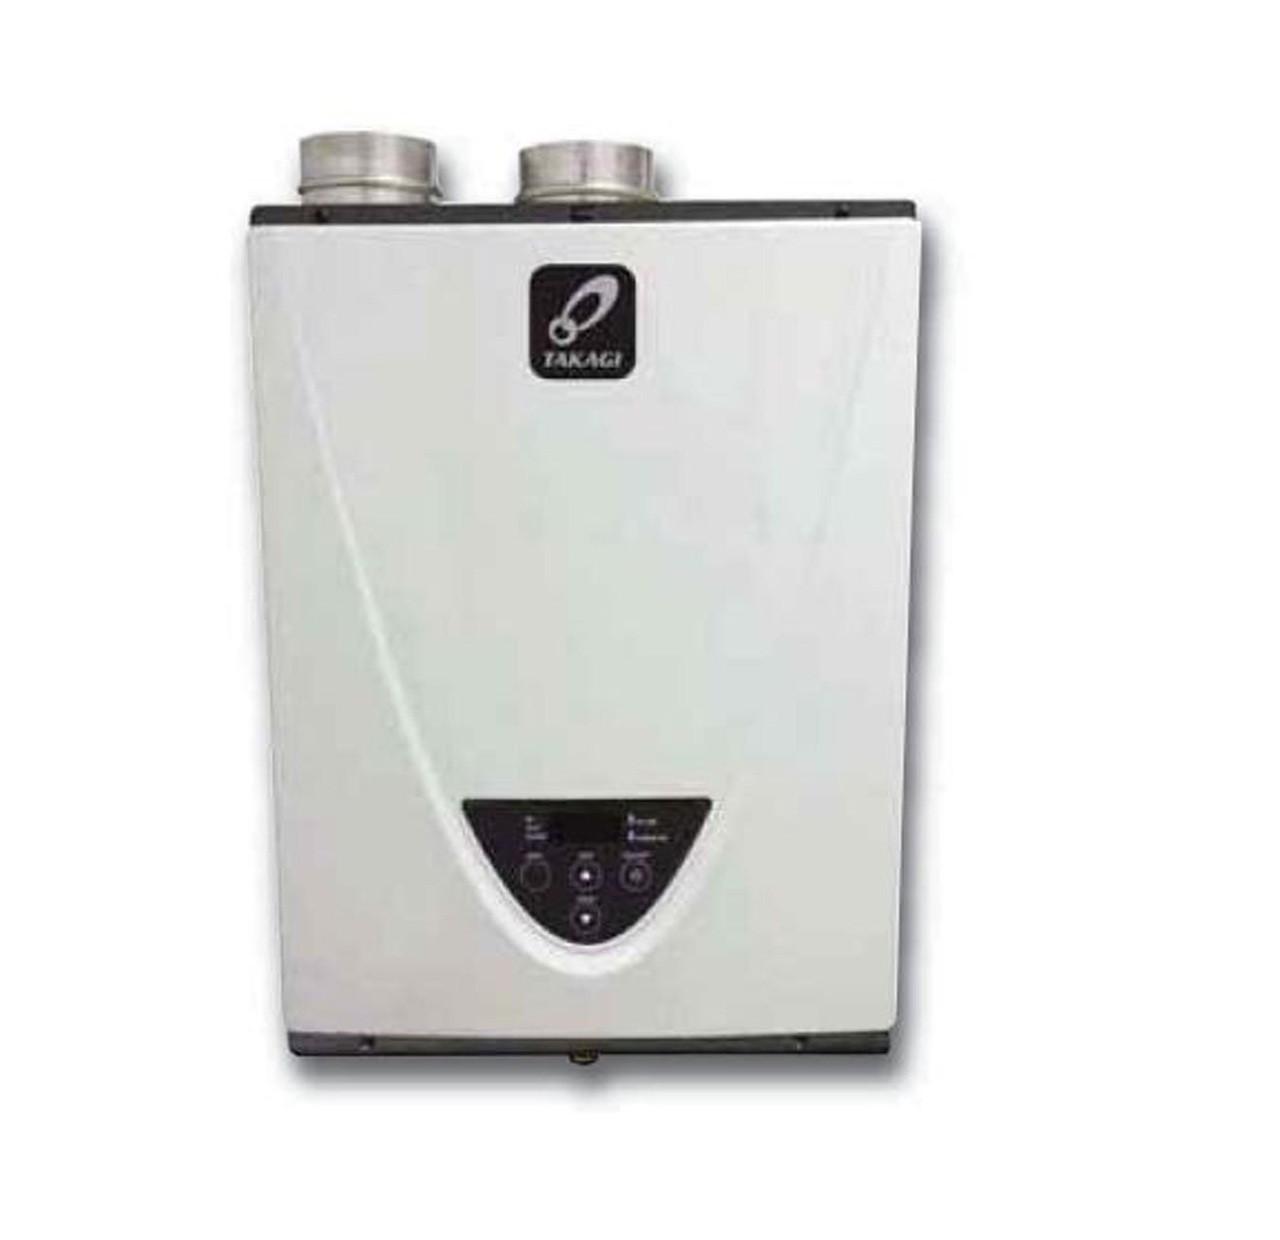 takagi indoor tankless water heater liquid propane th3dvp - Tankless Propane Water Heater